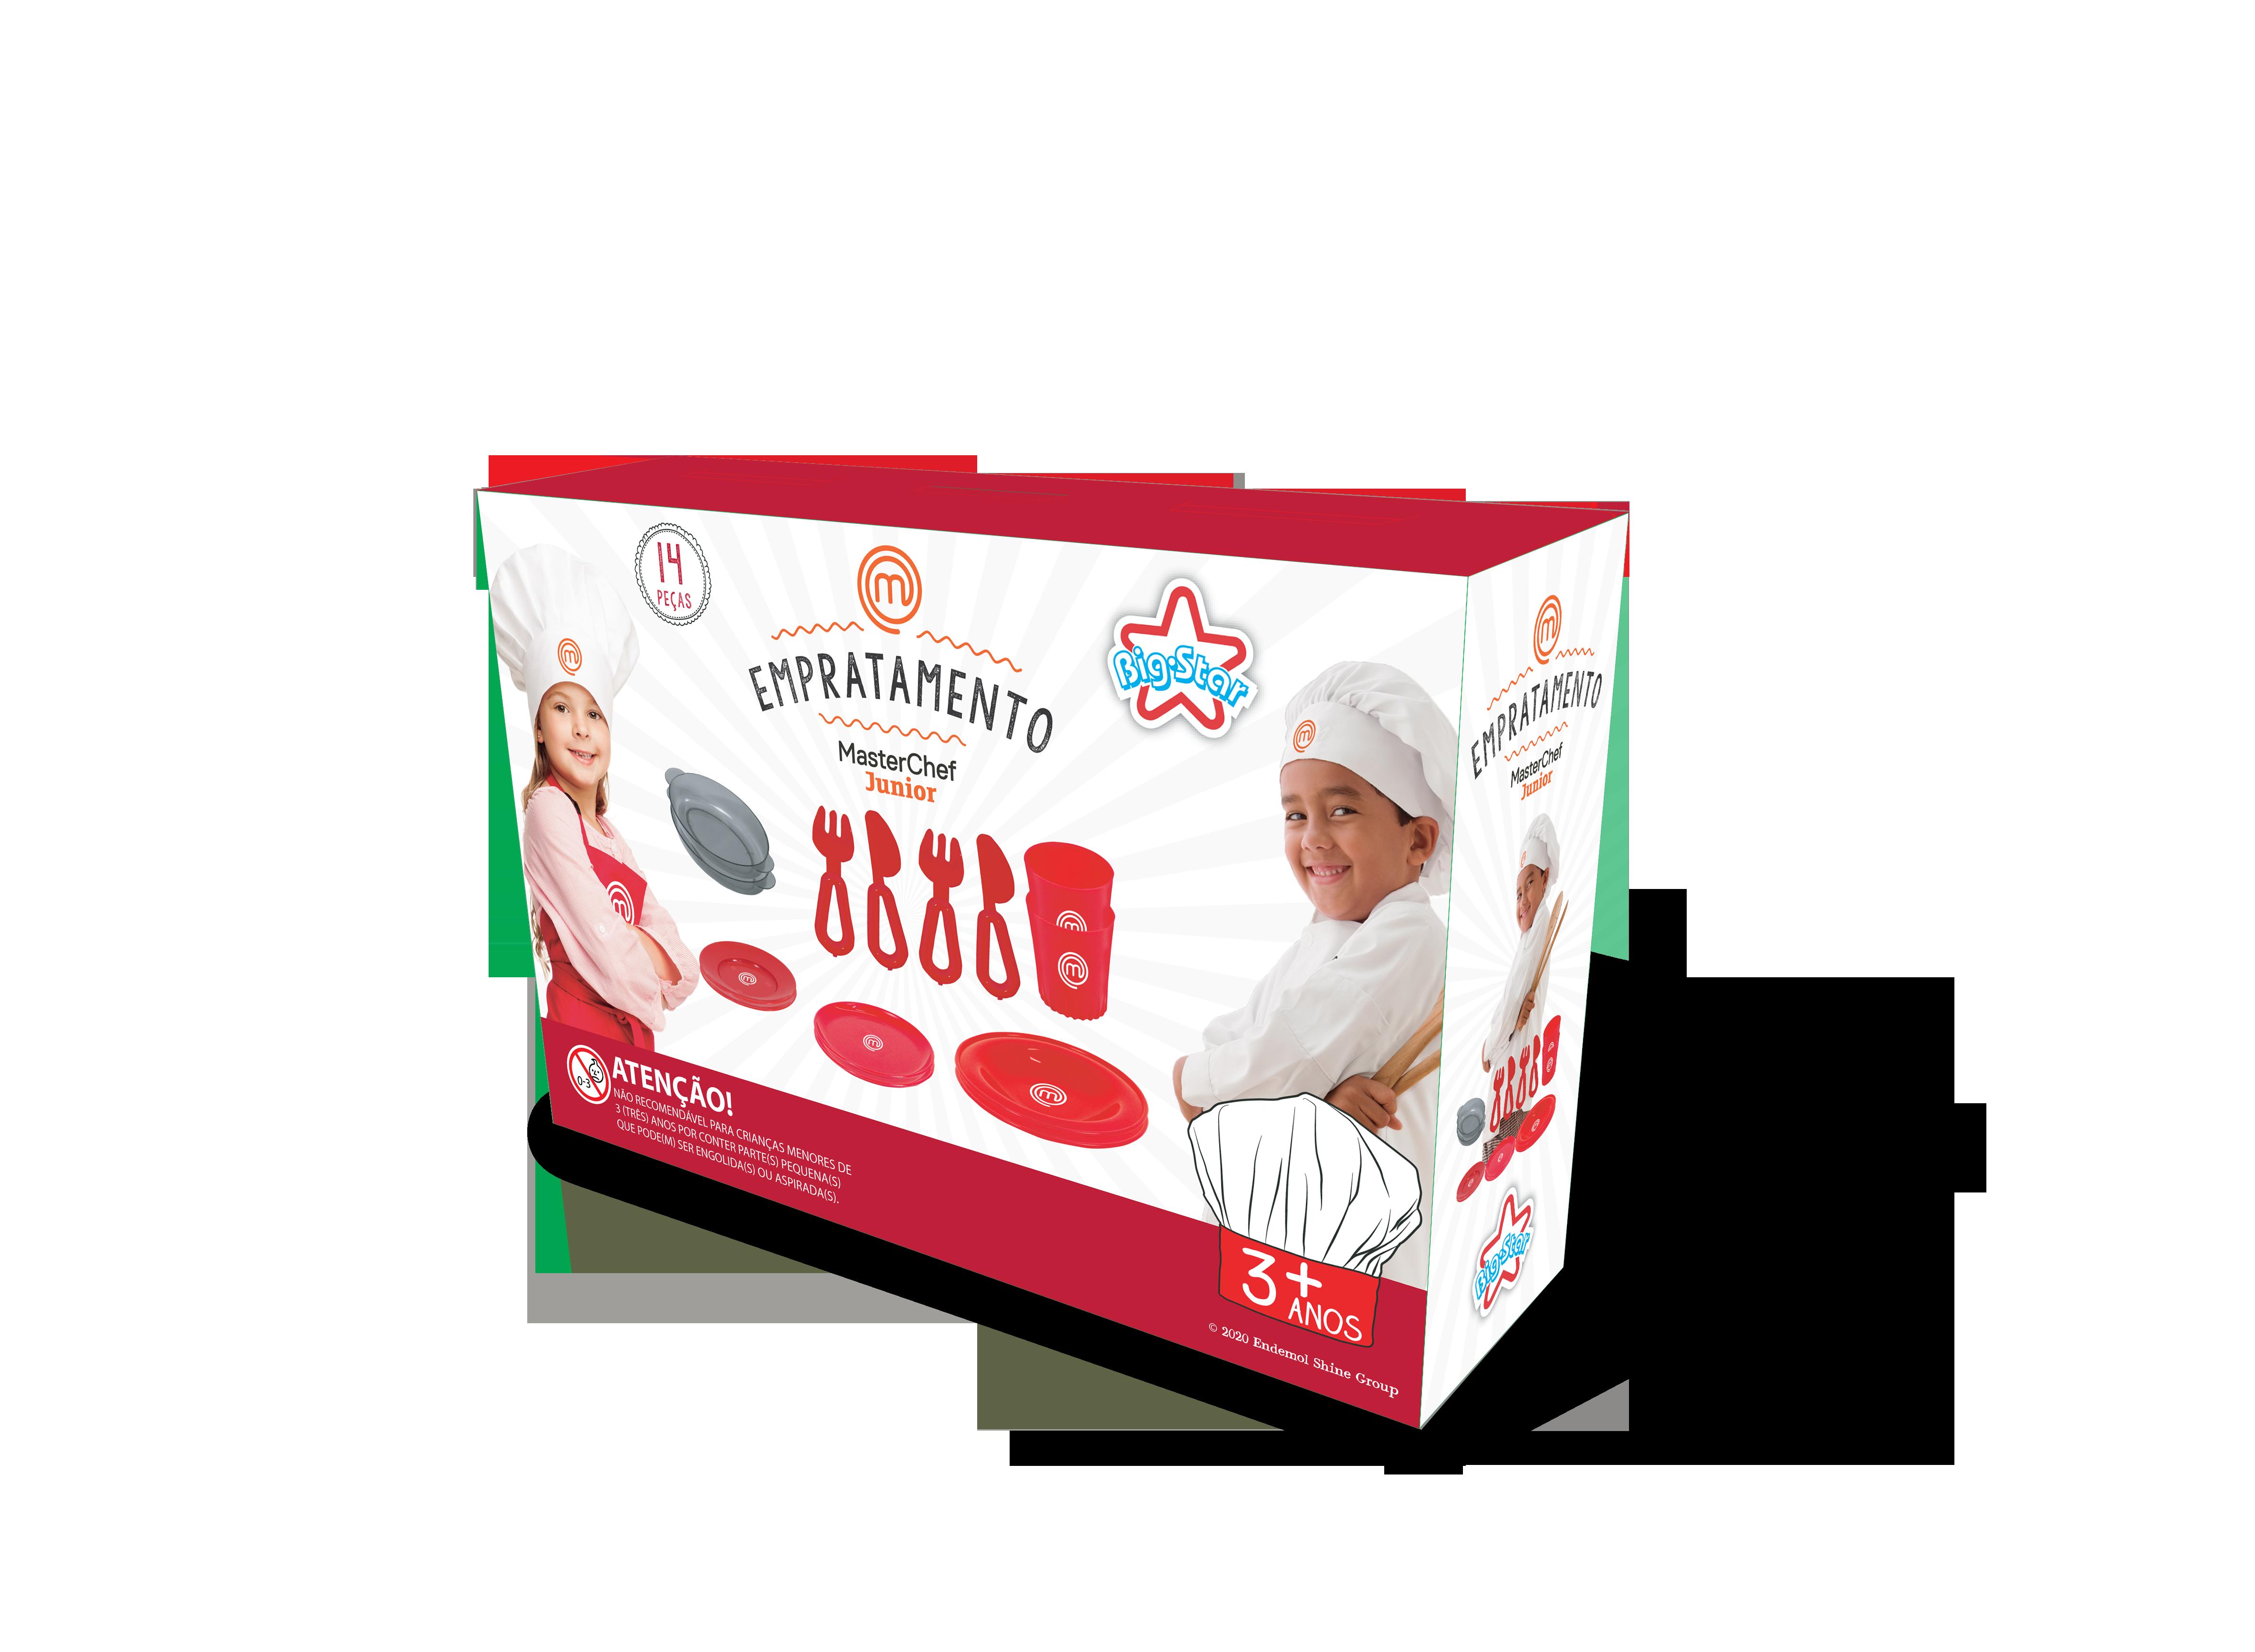 130-MCE - Master Chef Empratamento